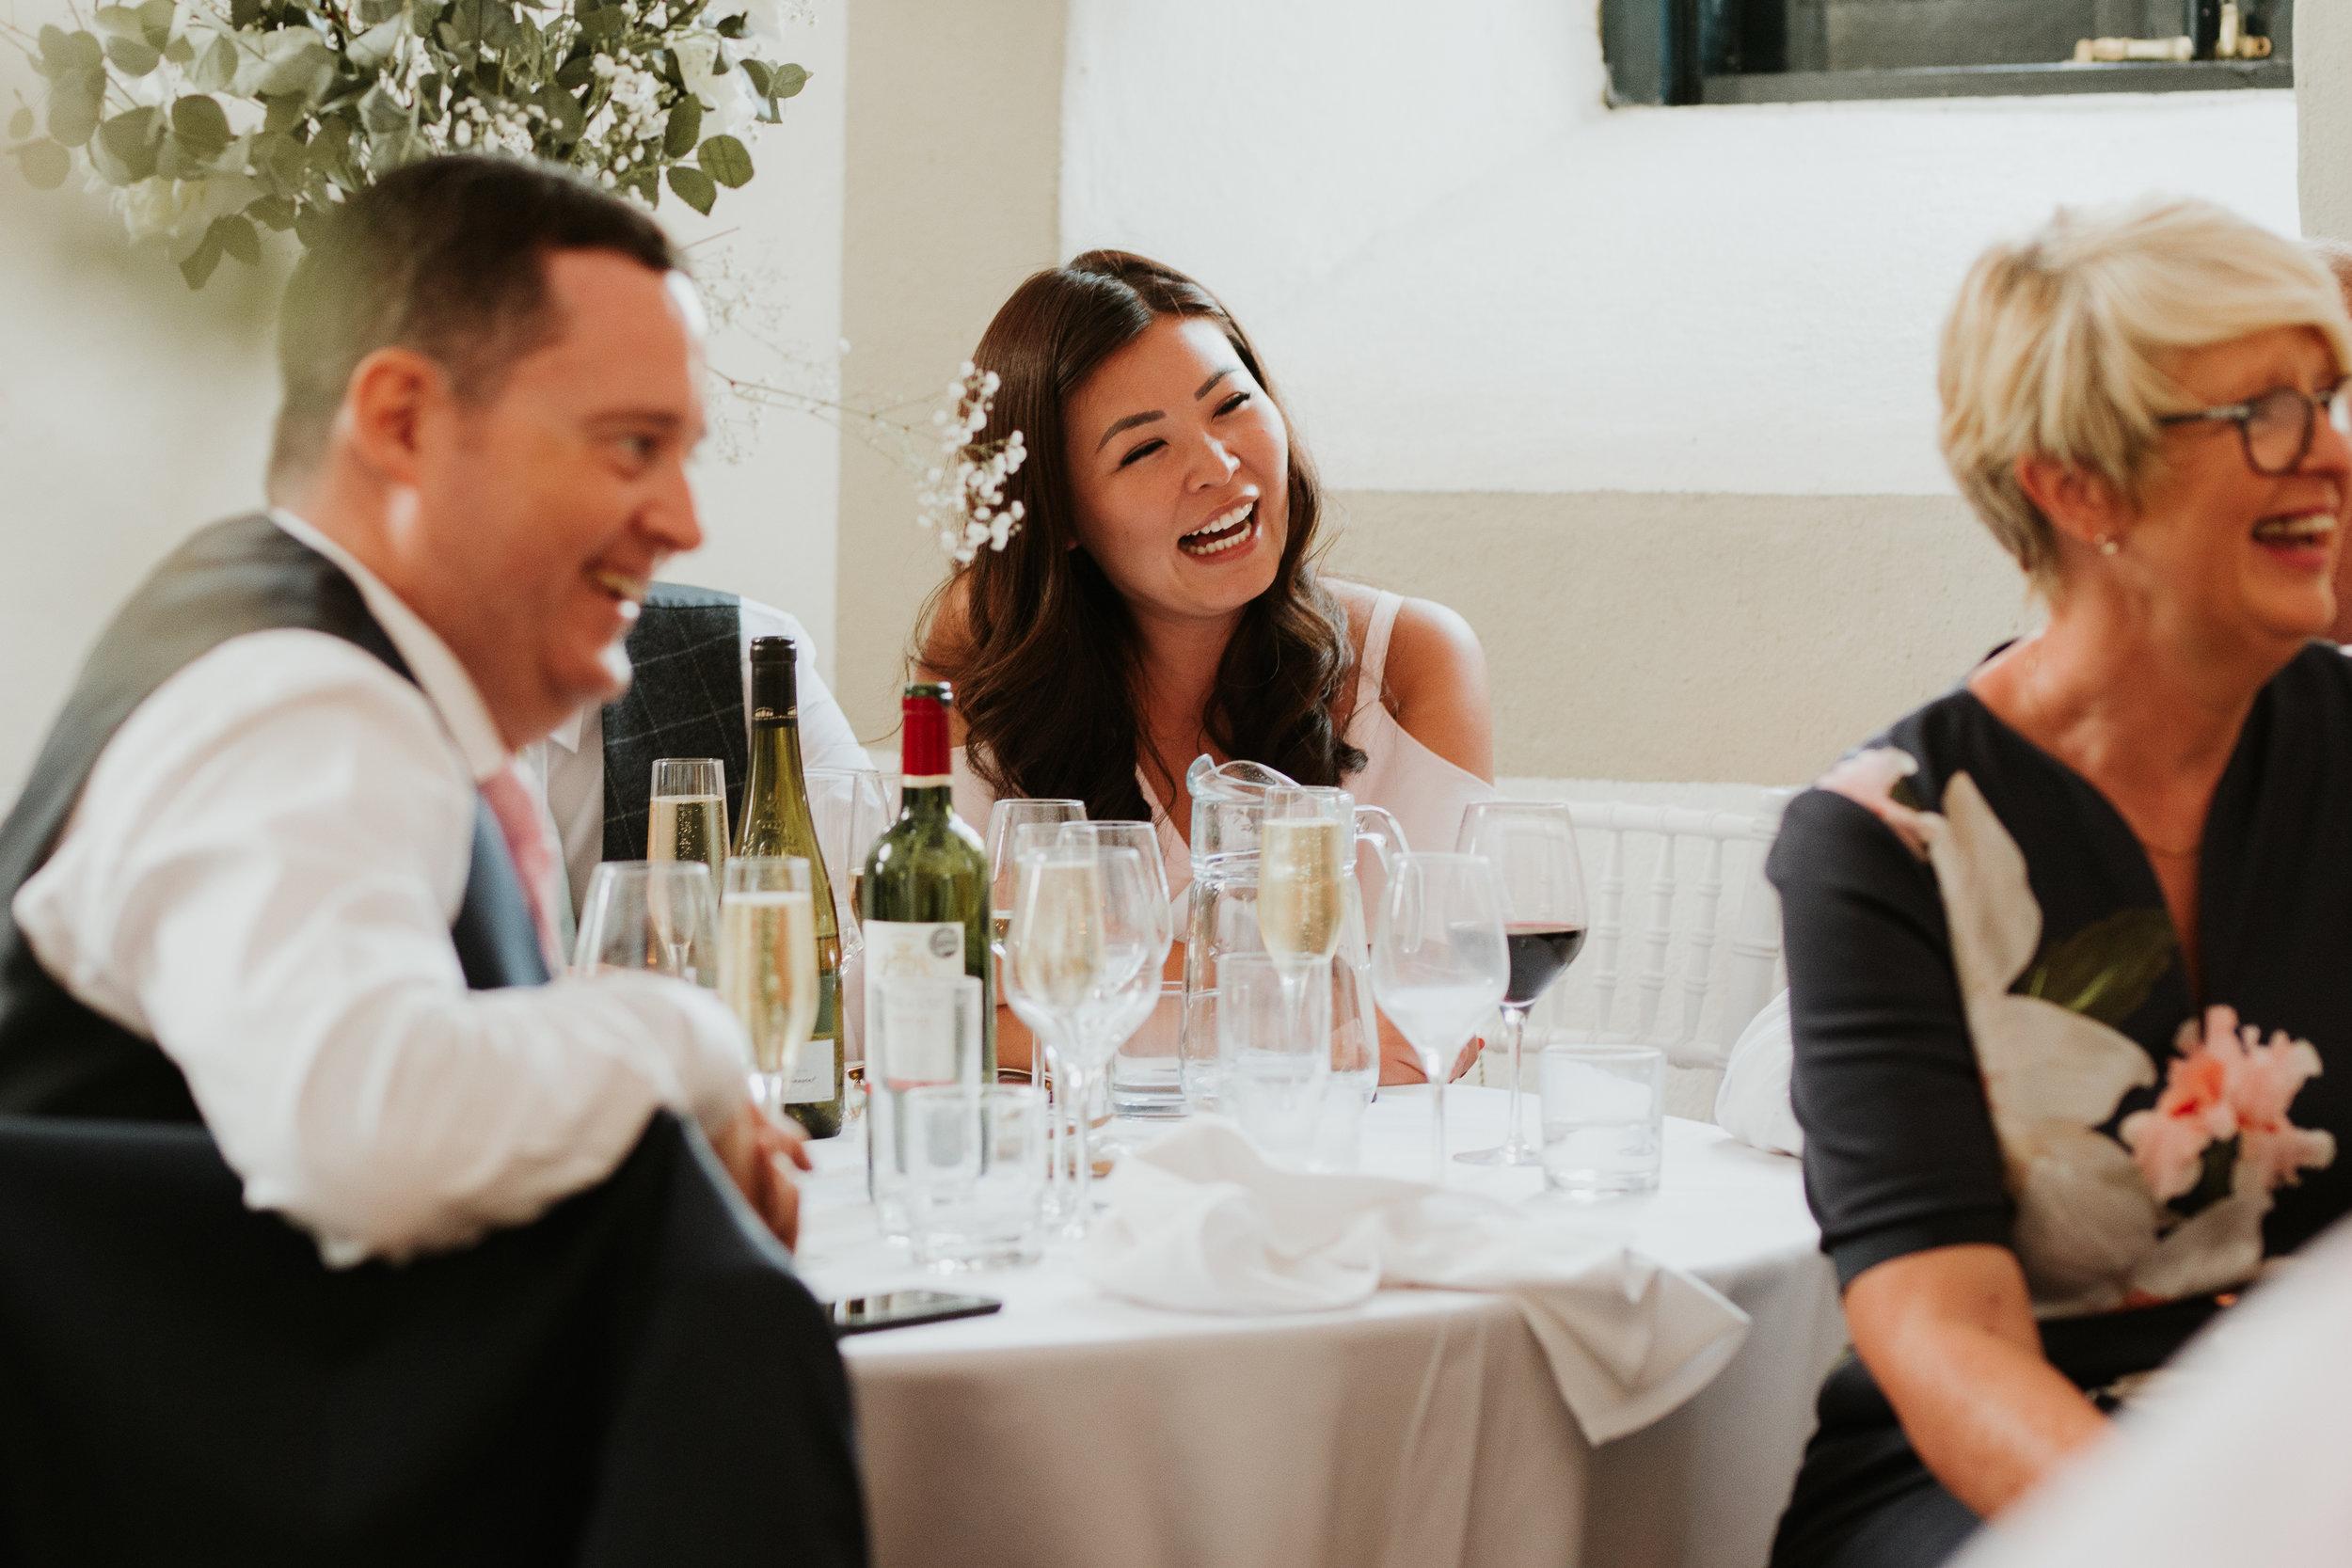 Oxfordshire-wedding-photographer-67.jpg